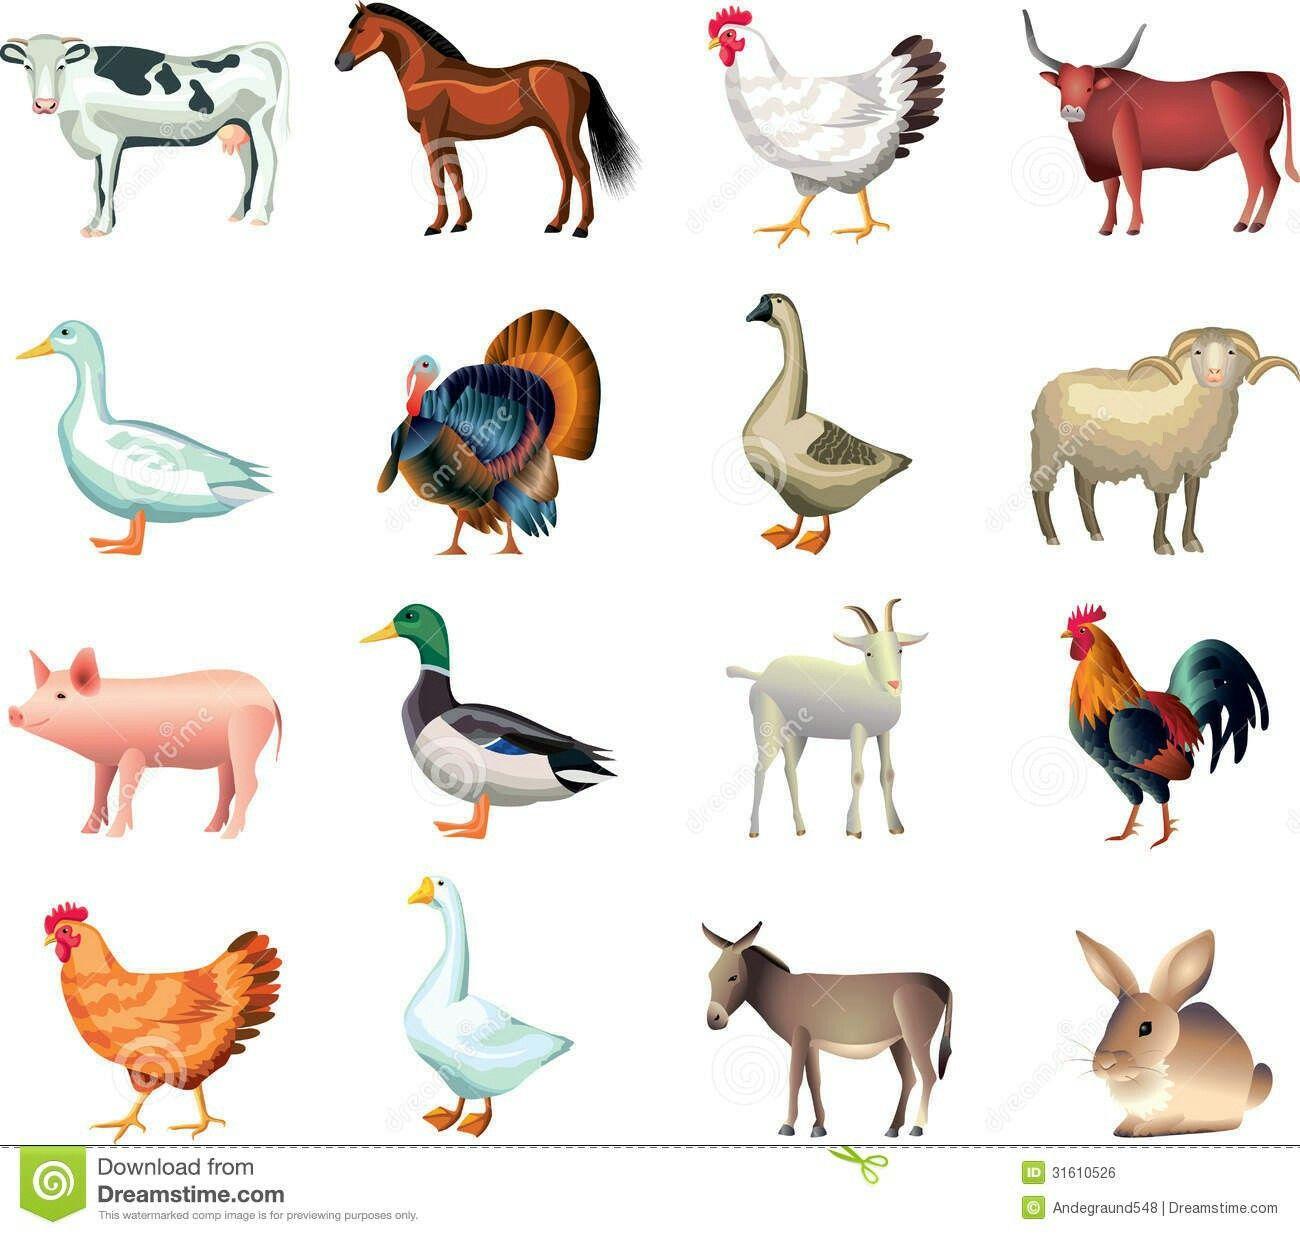 Pin By Sarah Sartori On Paper Arts Animal Clipart Farm Art Stock Images Free